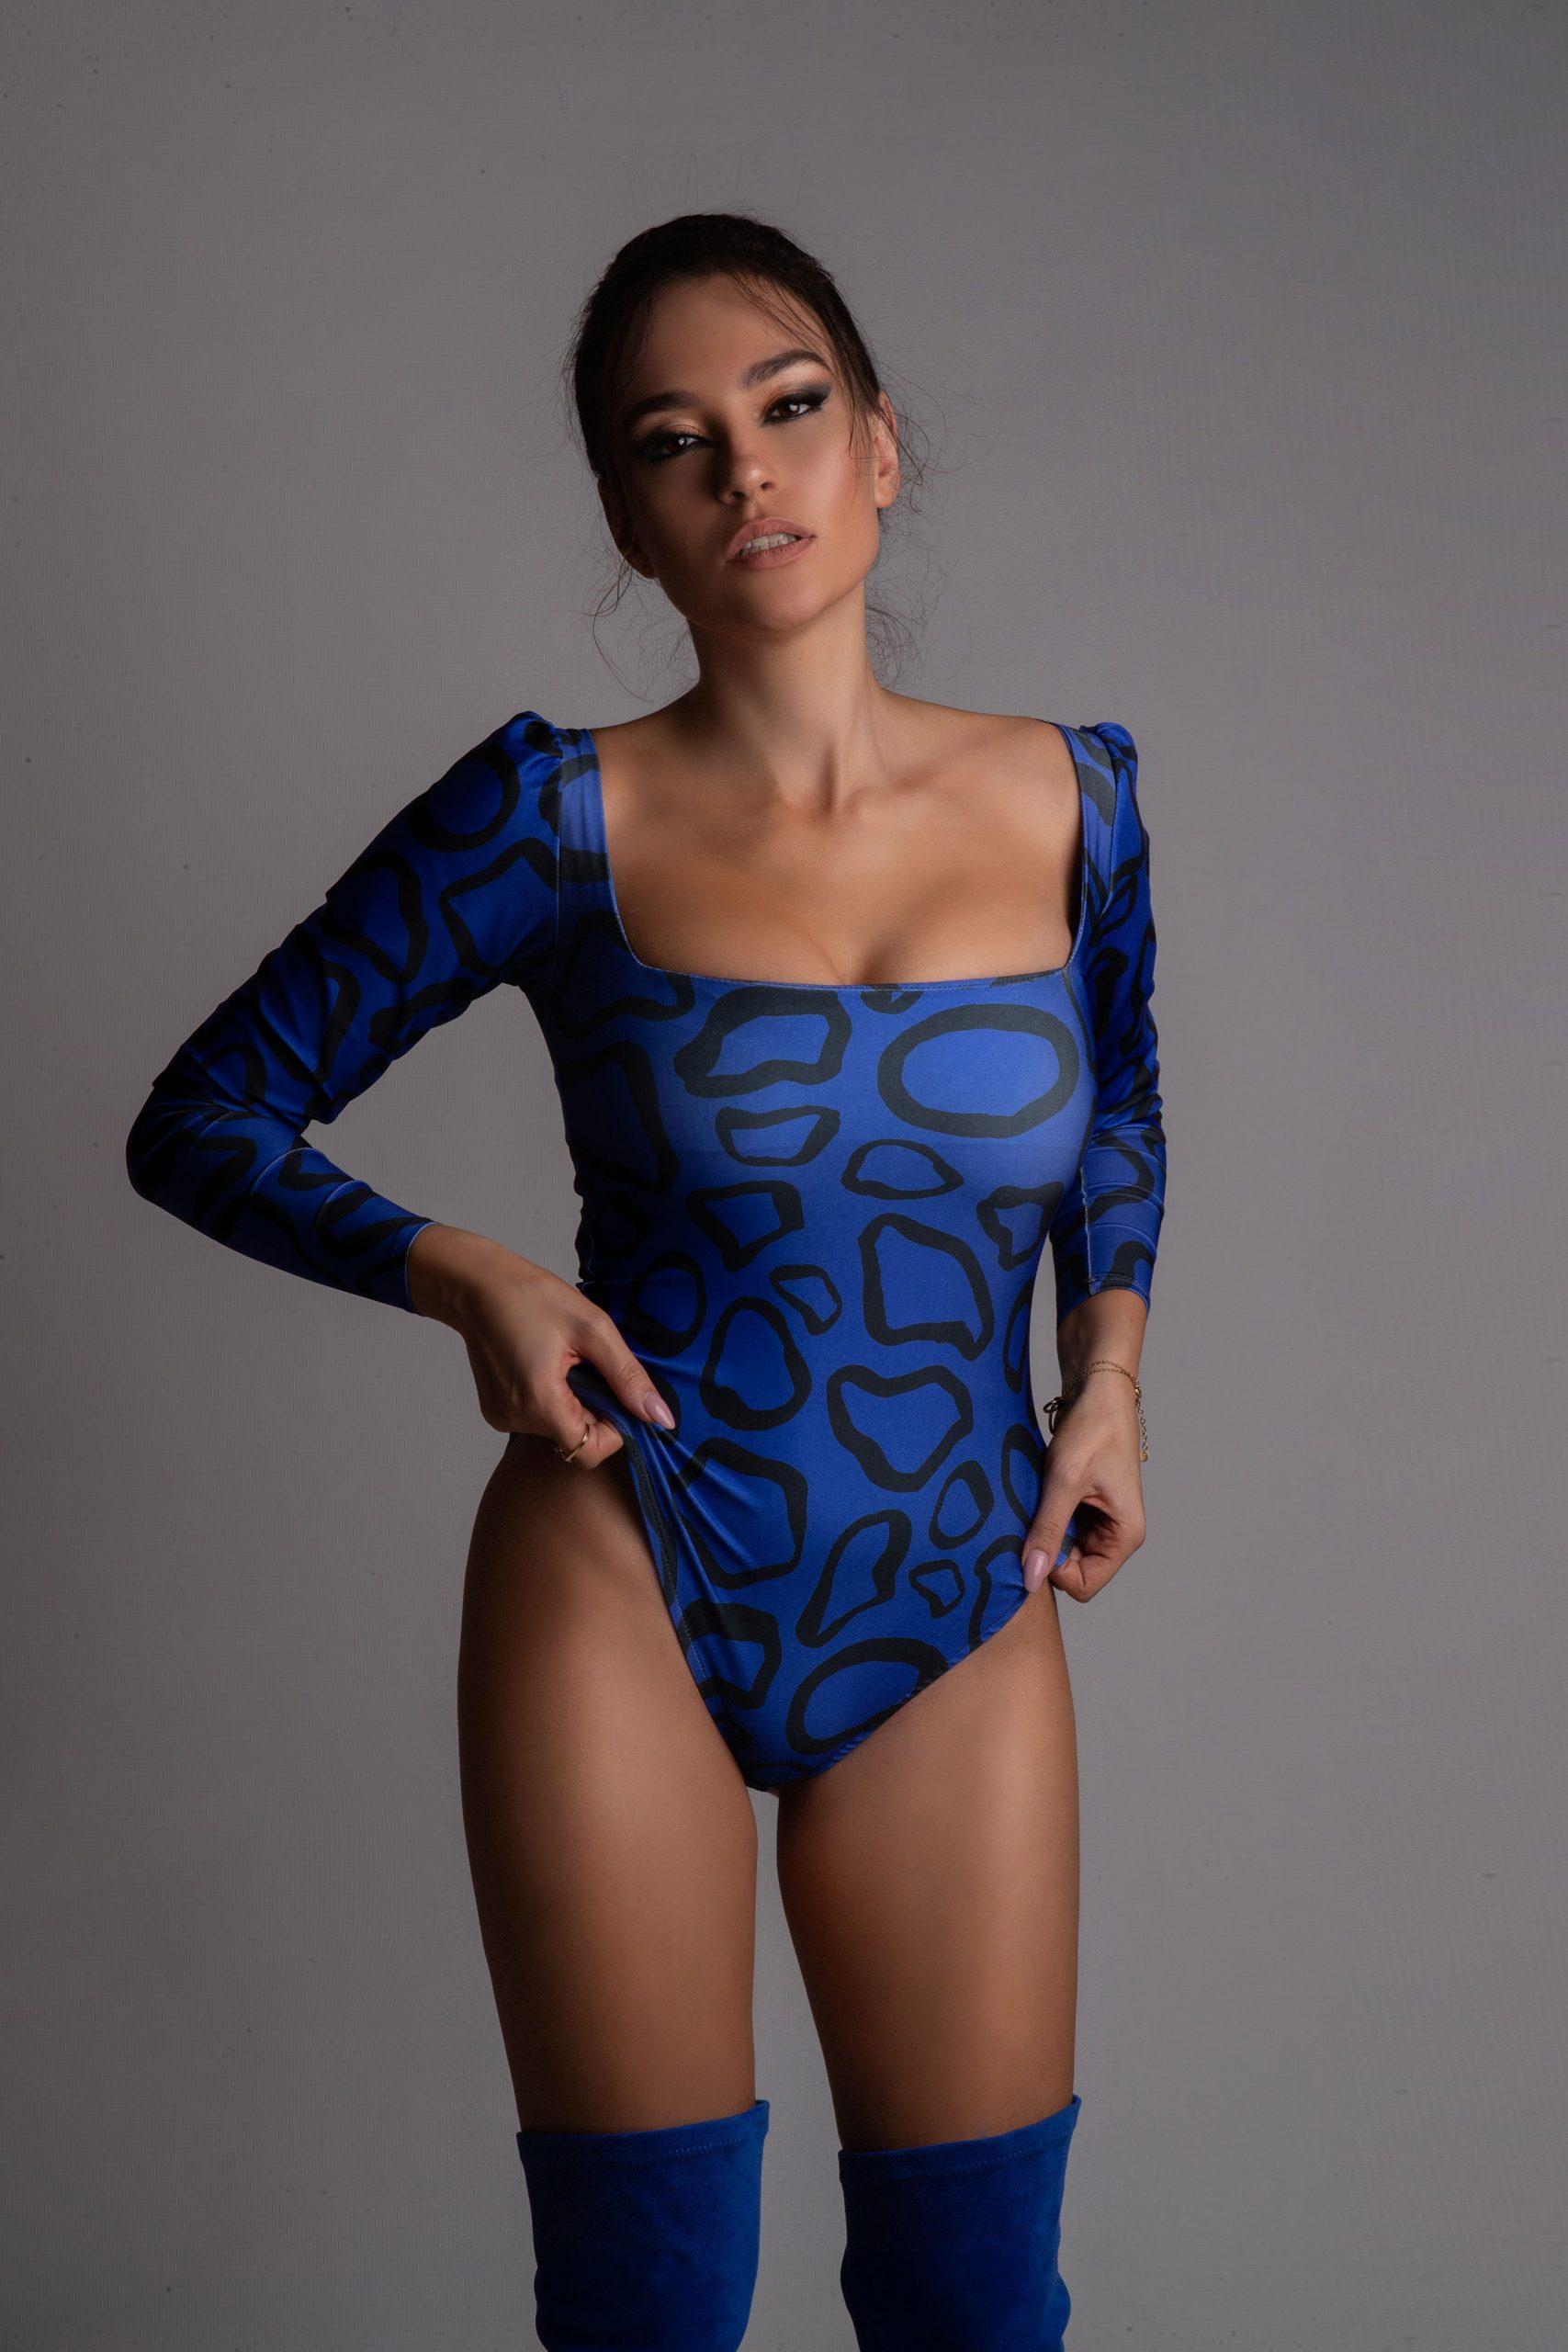 Eva Murati as celebrity Endorsement